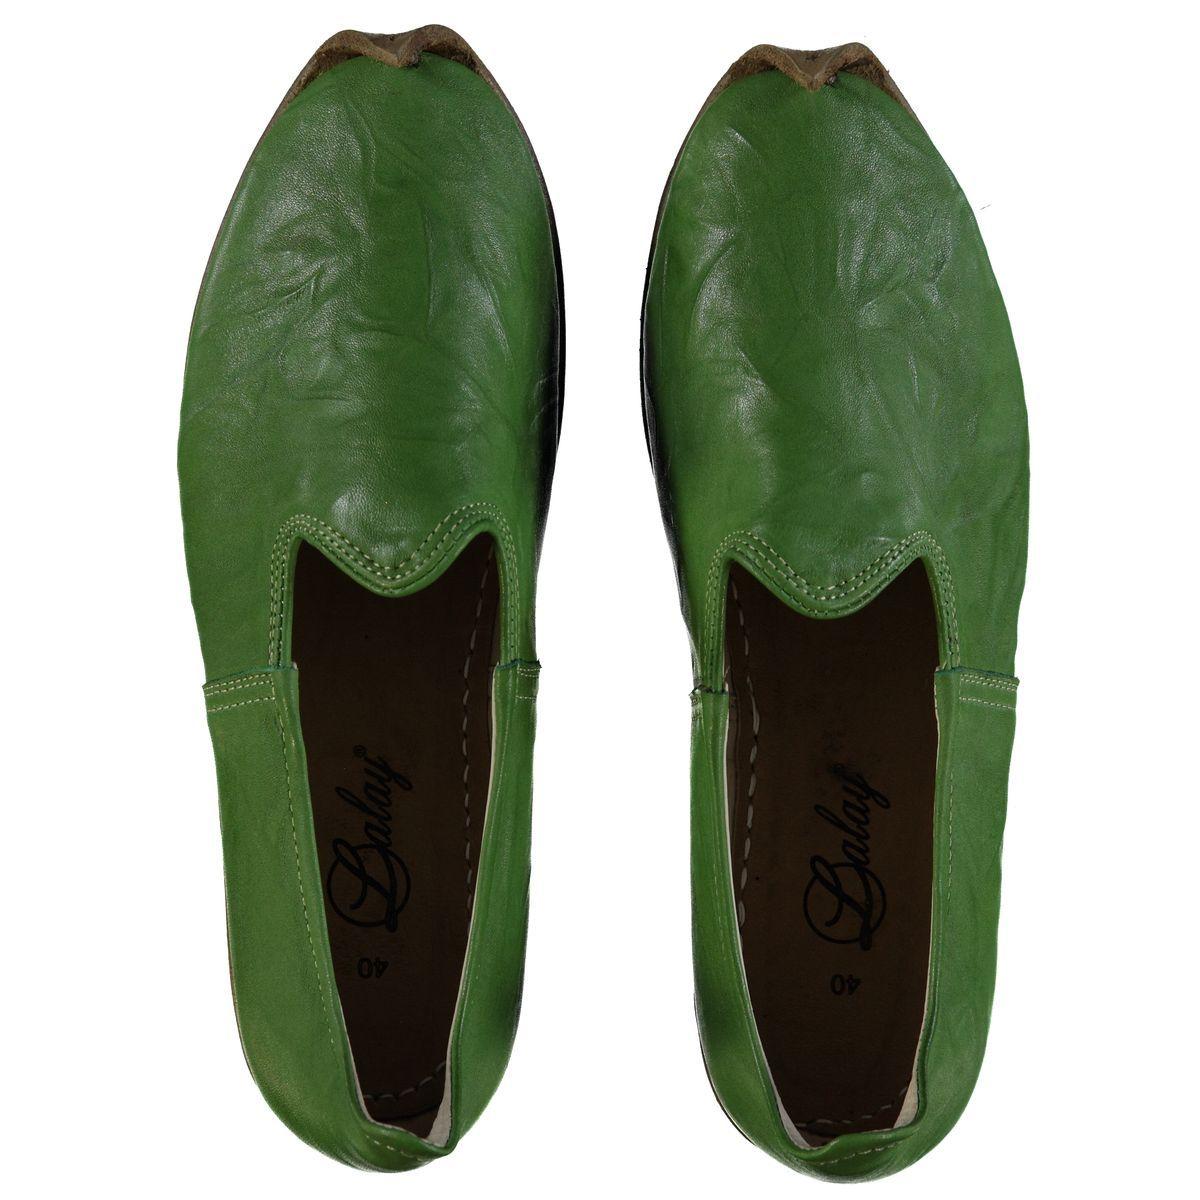 Shoe - Babouche / Leather / Handmade - Green